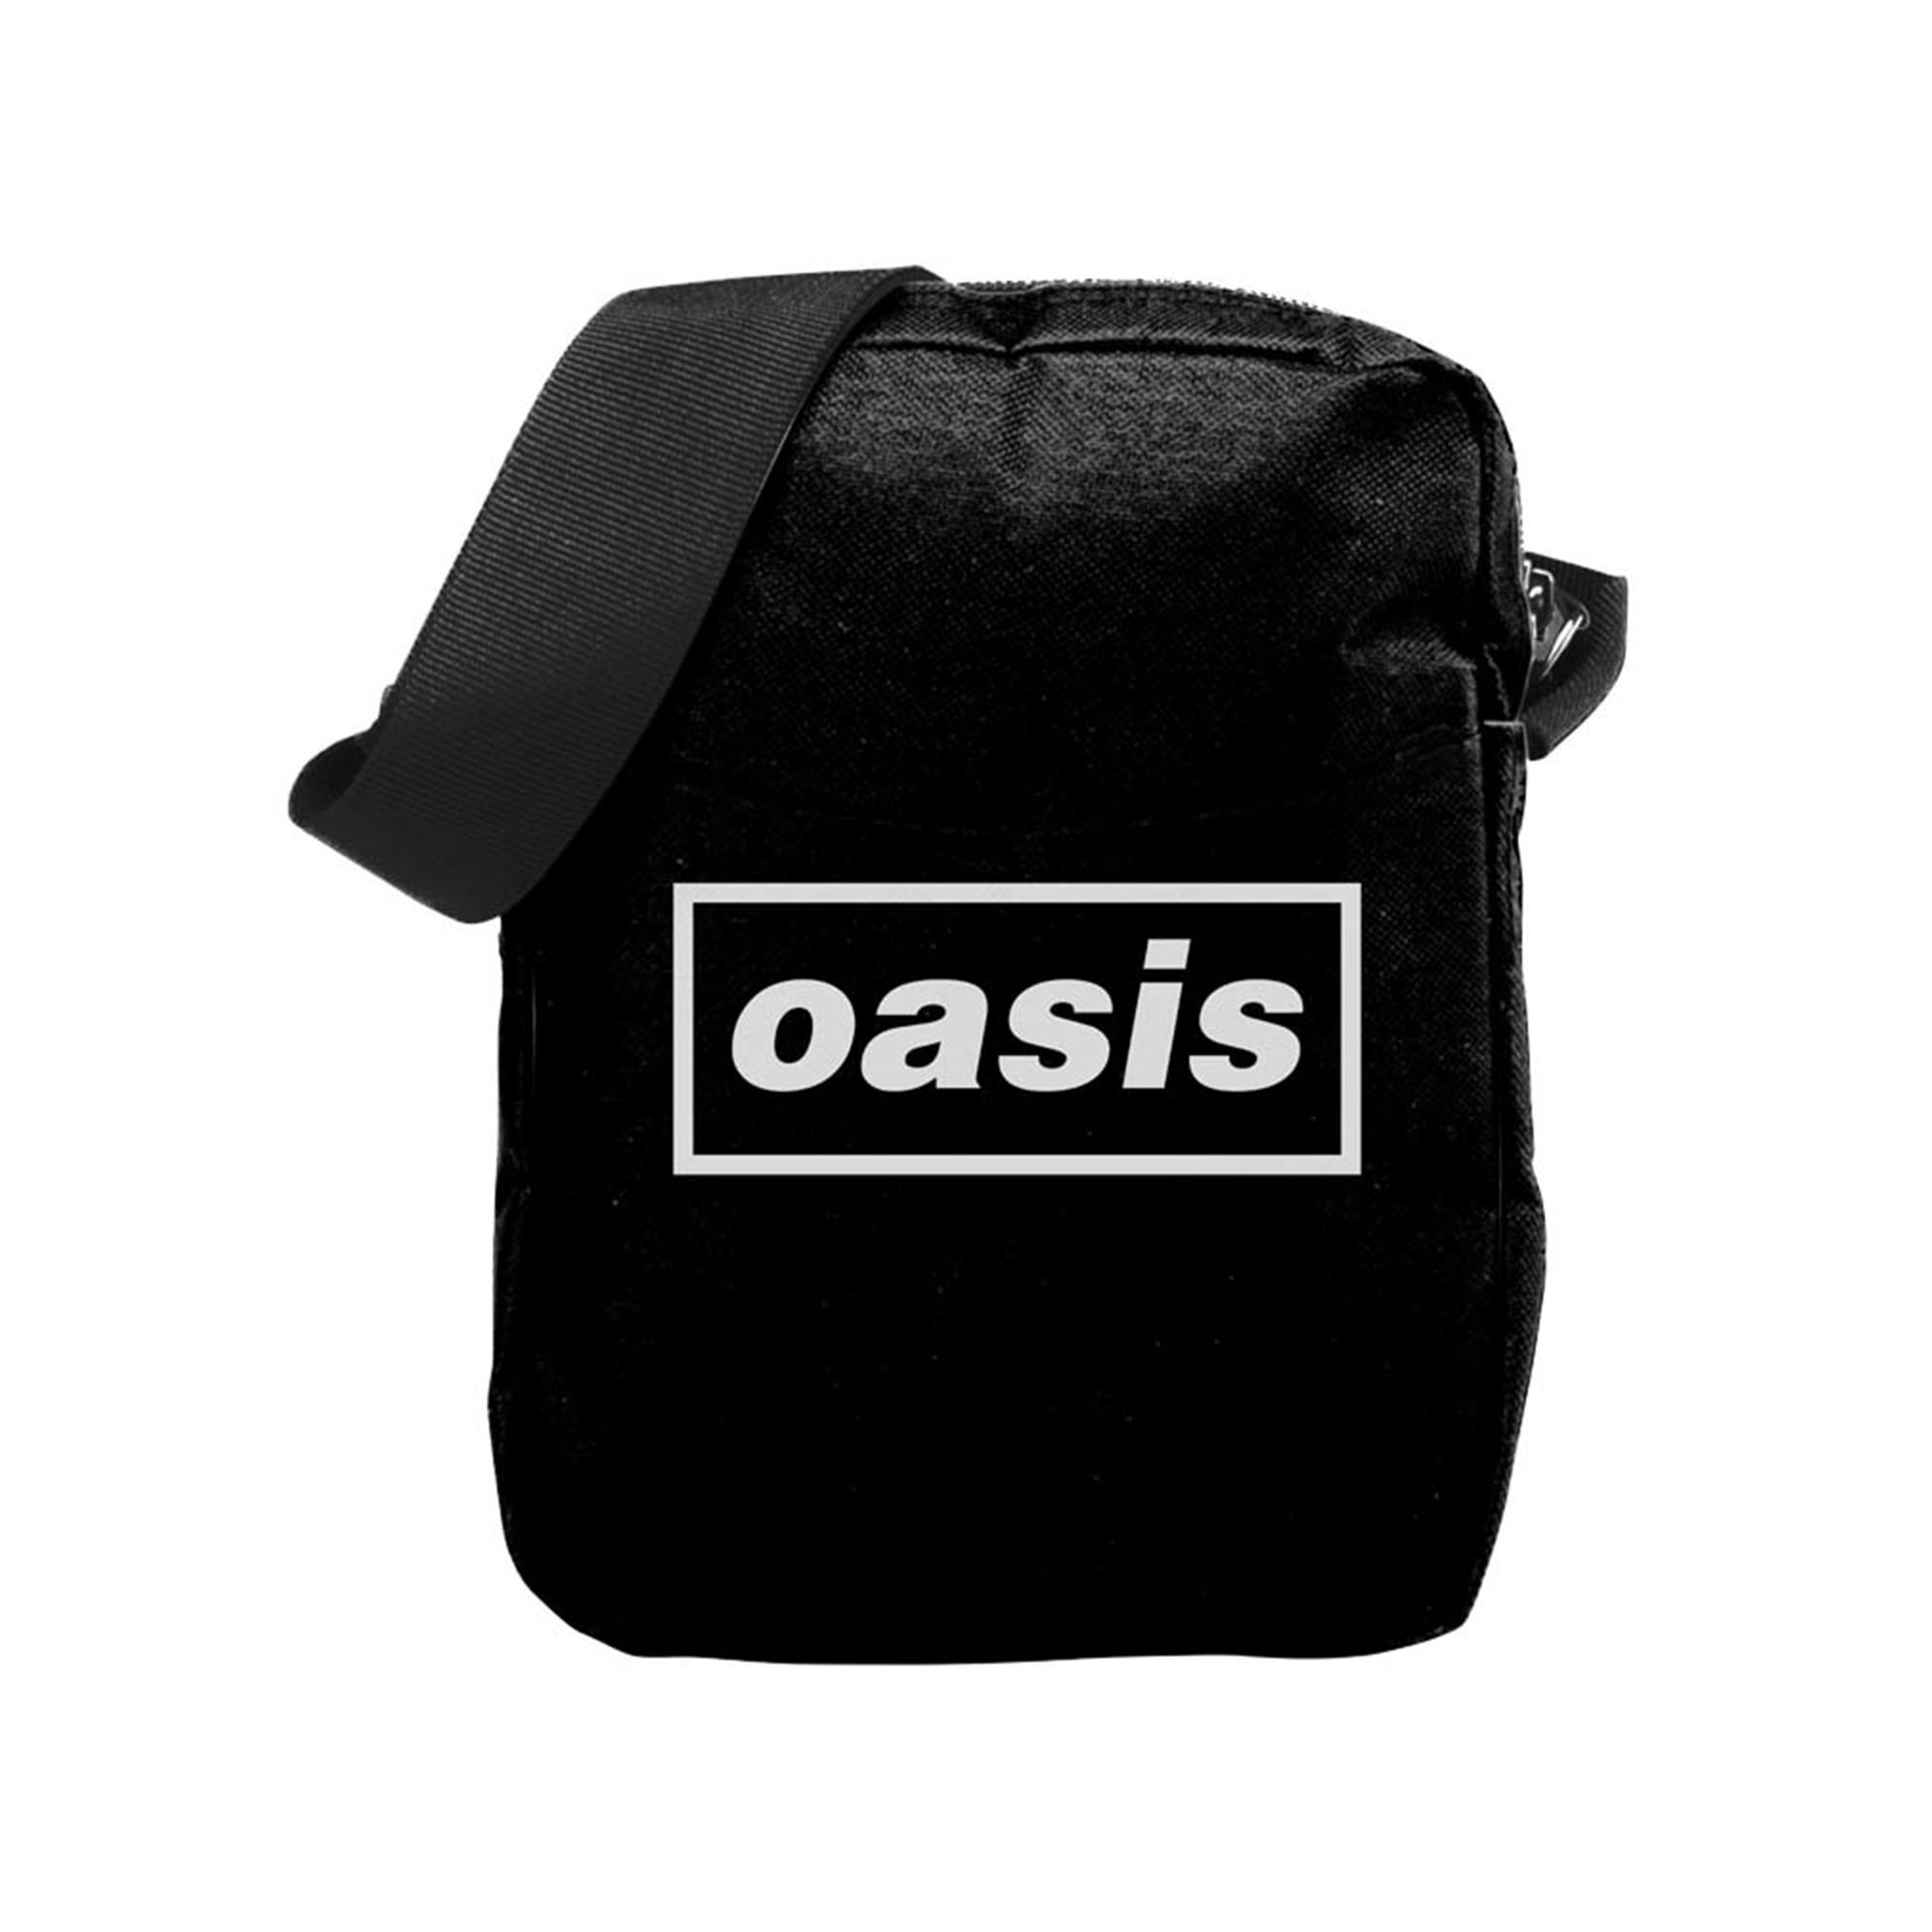 Oasis Crossbody Bag